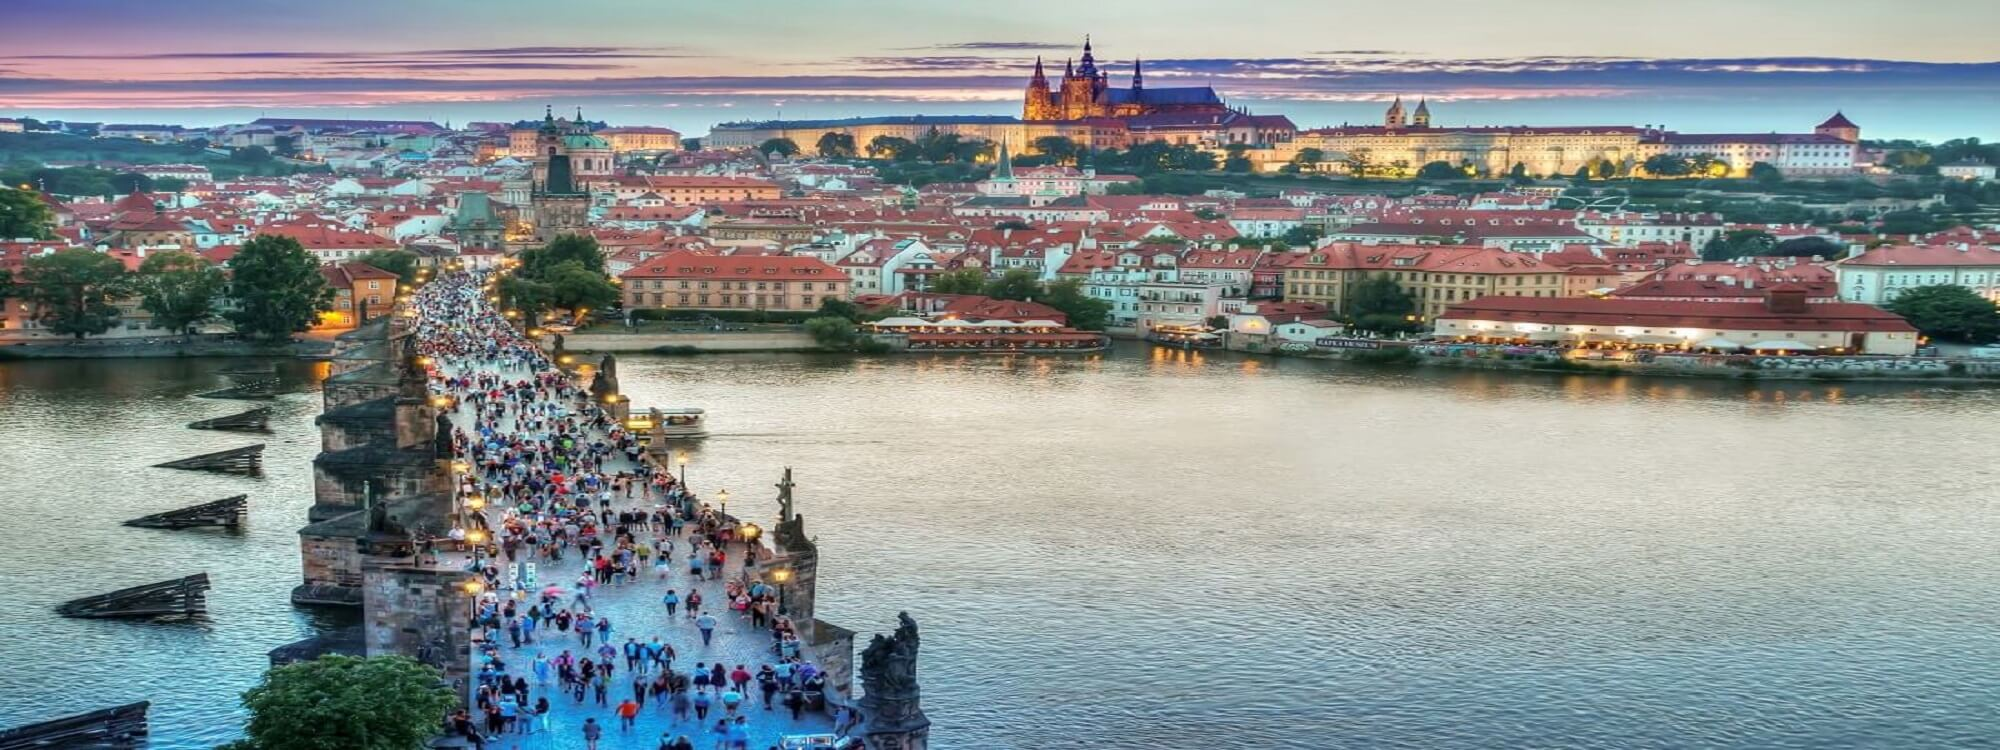 Forår i Prag